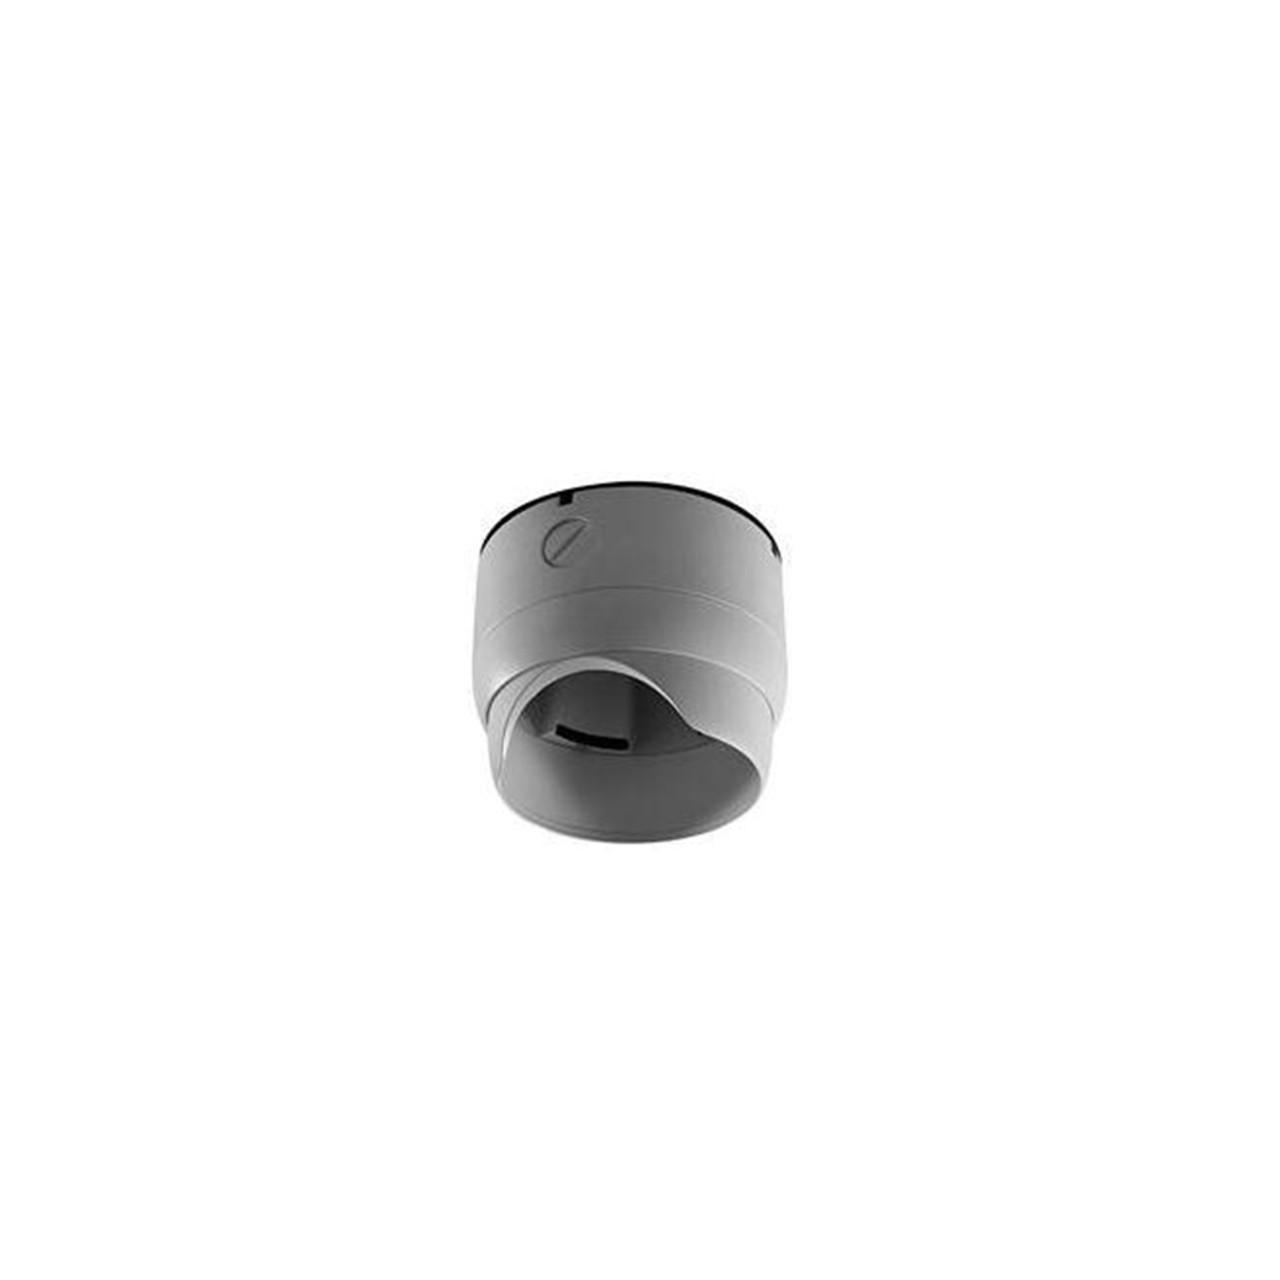 HikVision CB110 Wire Intake Box for Dome Camera